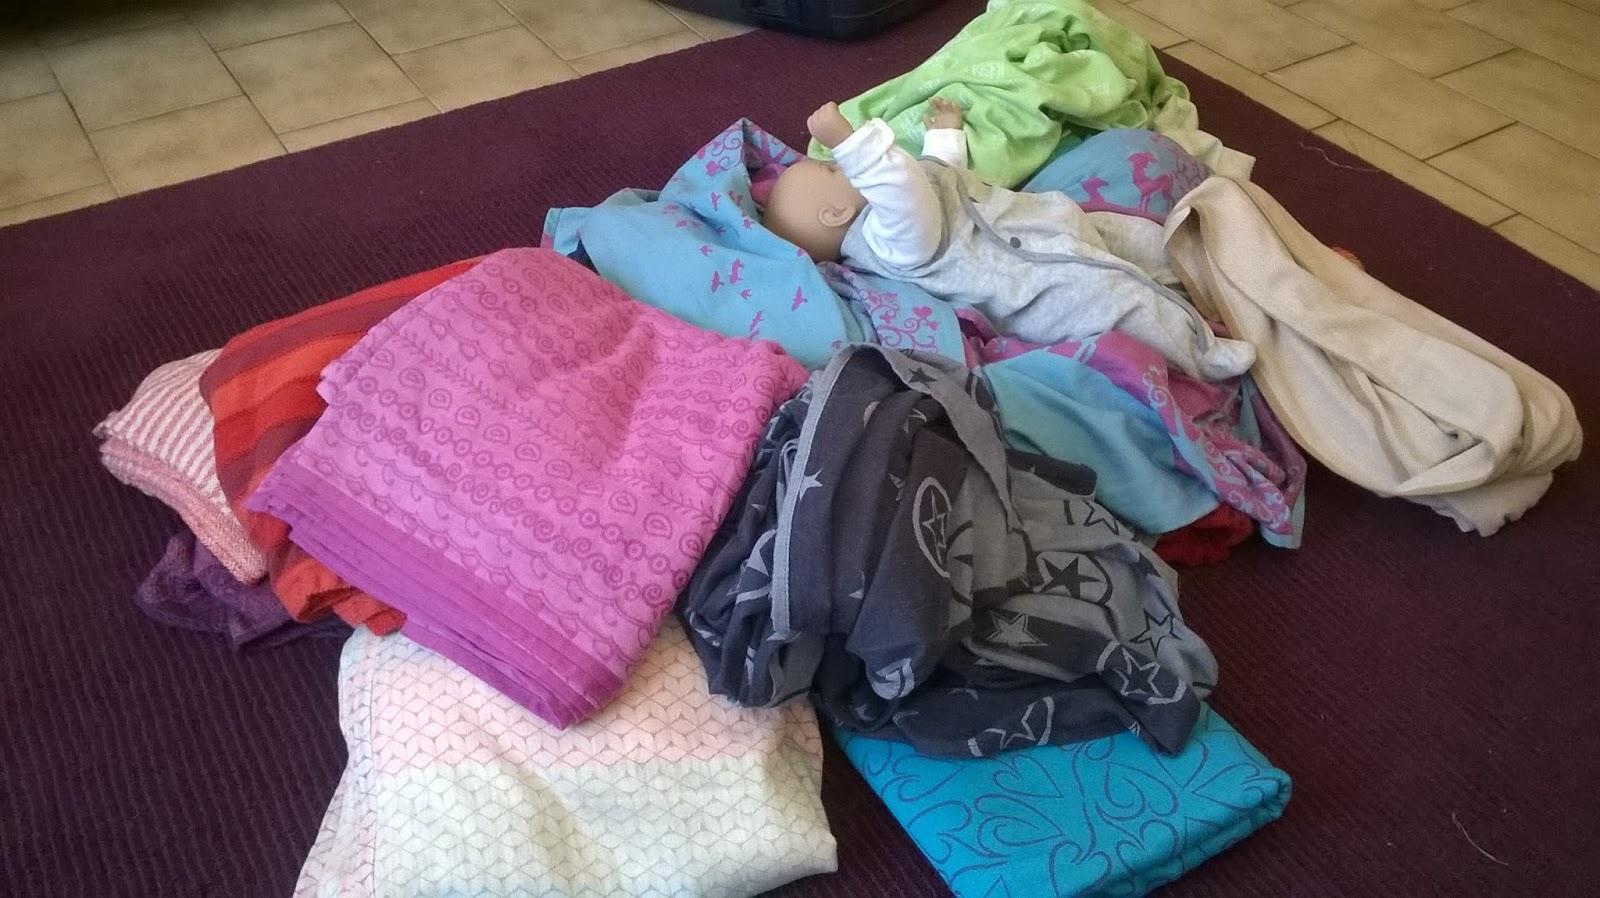 fidella hoppediz kokadi hilla slings néobulle écharpe tissée storchenwiege  portage babywearing wrap adc3b4f0cb6